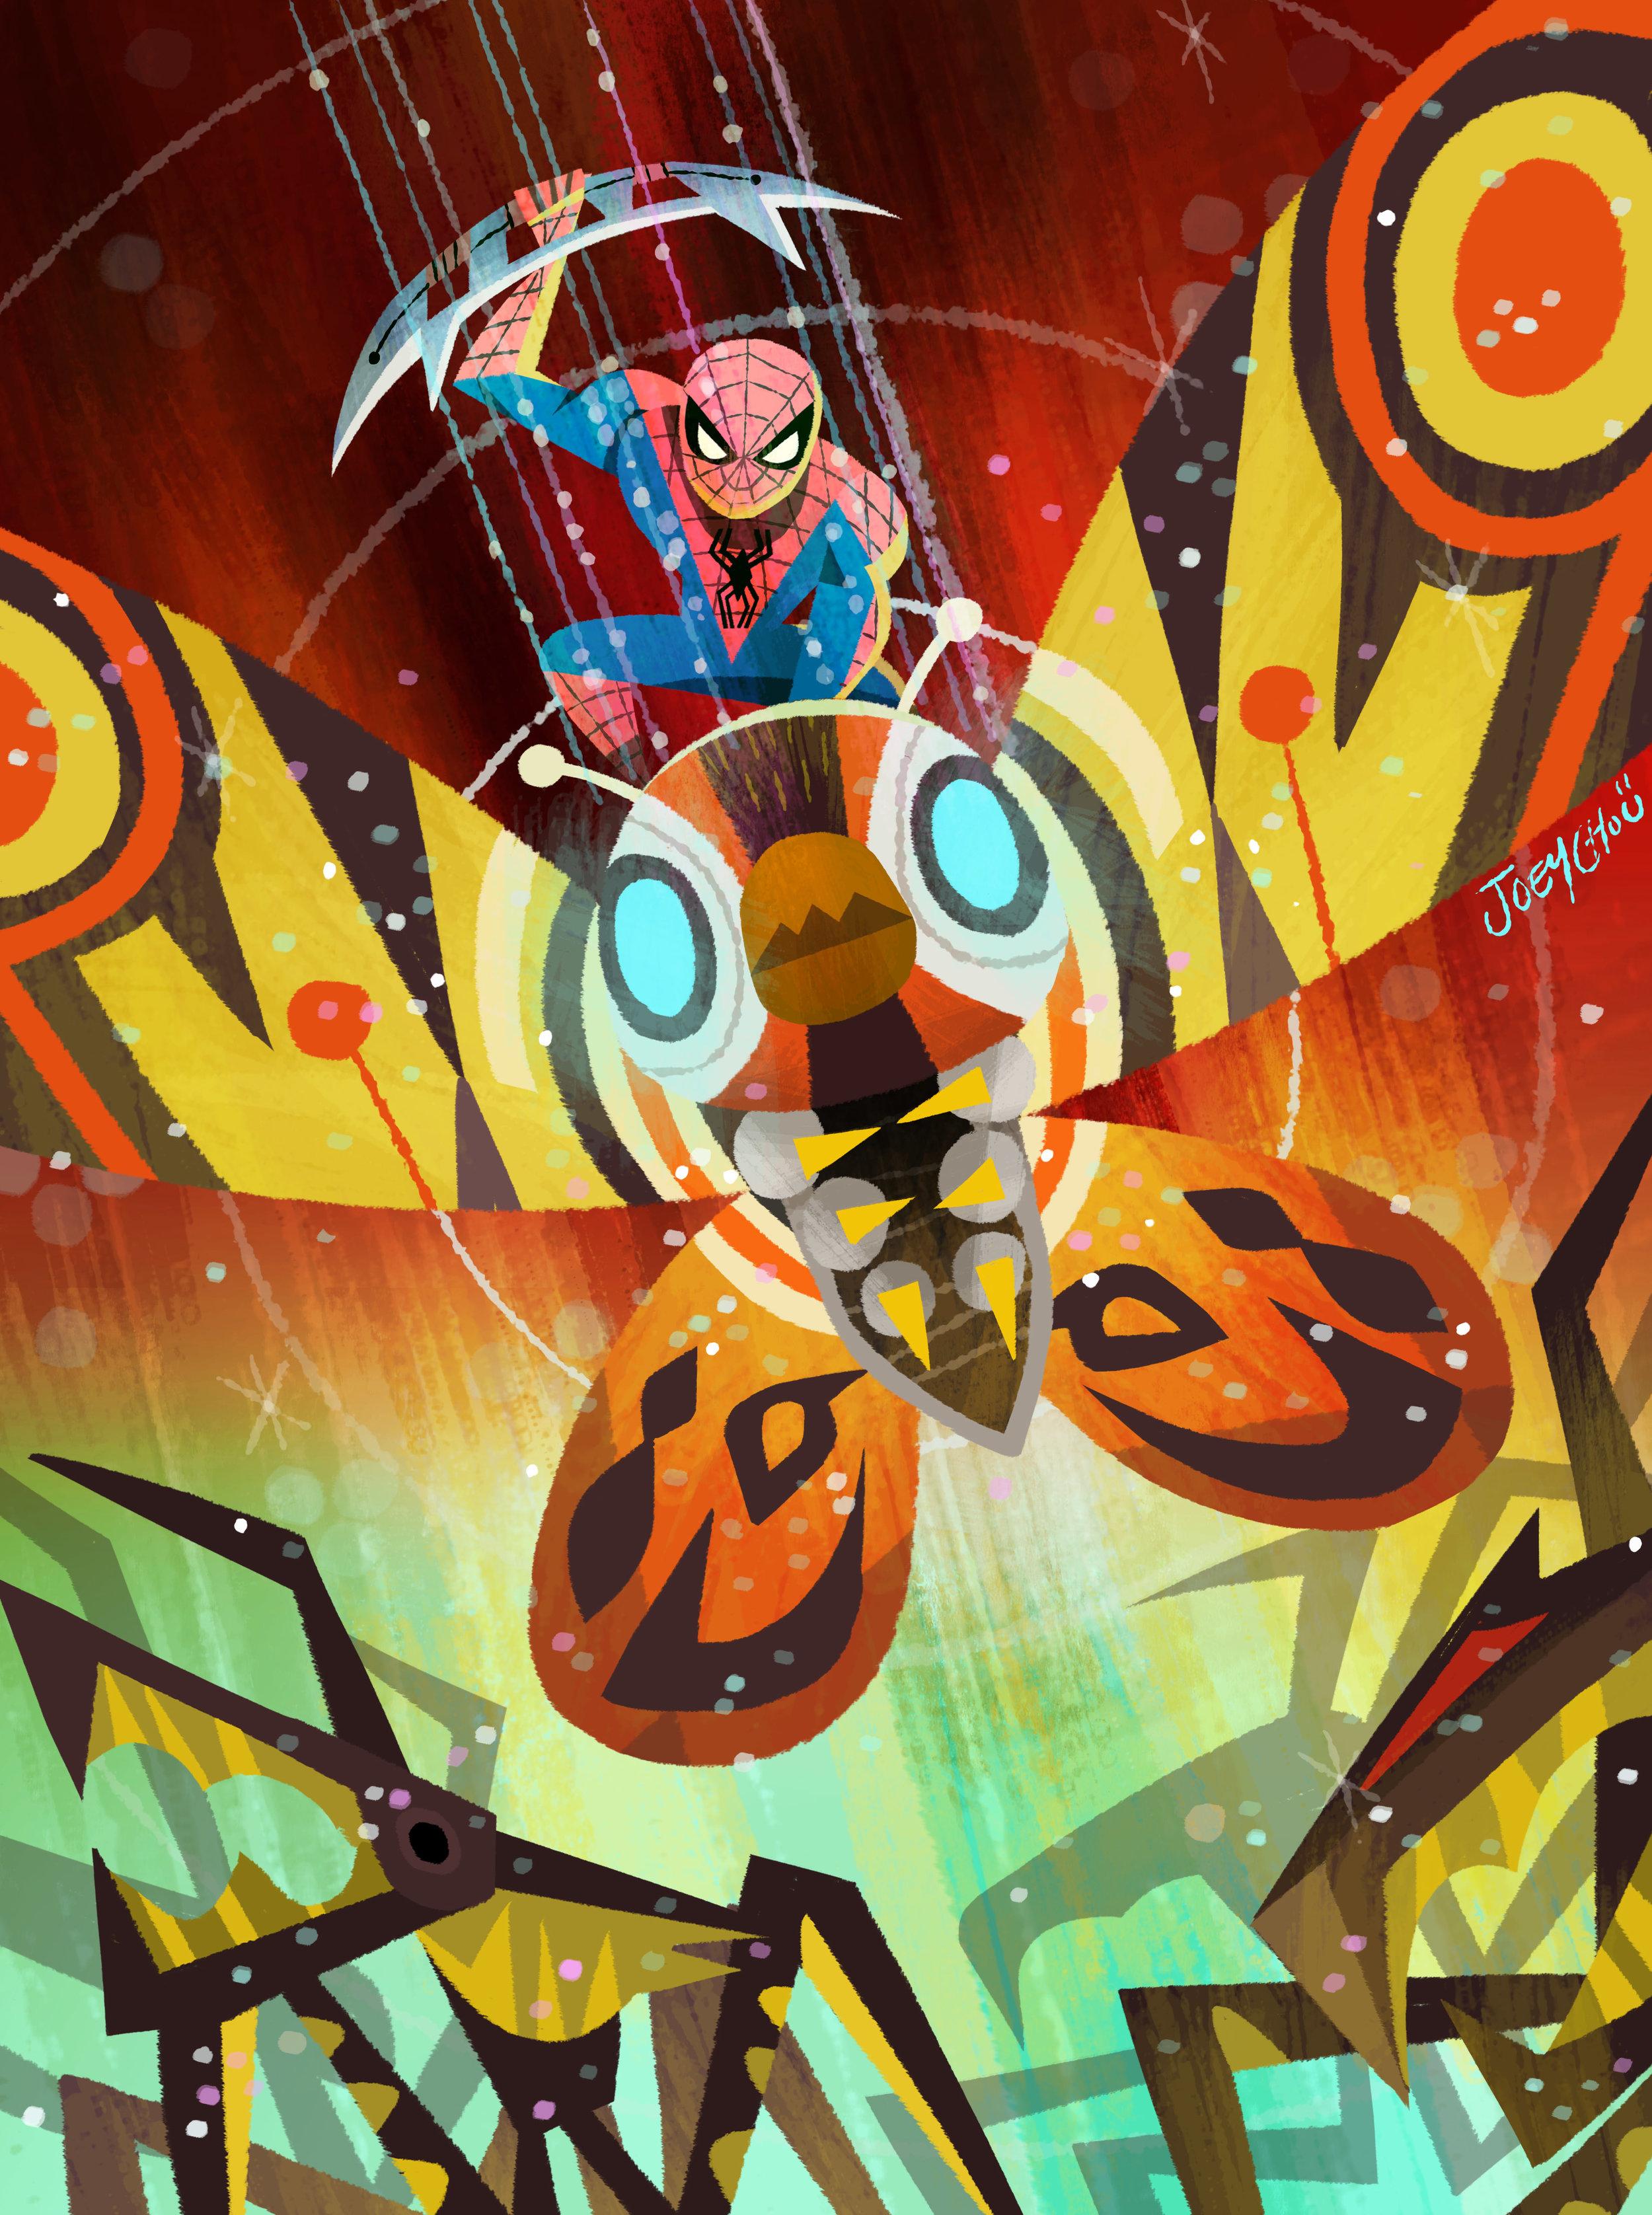 spiderman_mothra_print.jpg